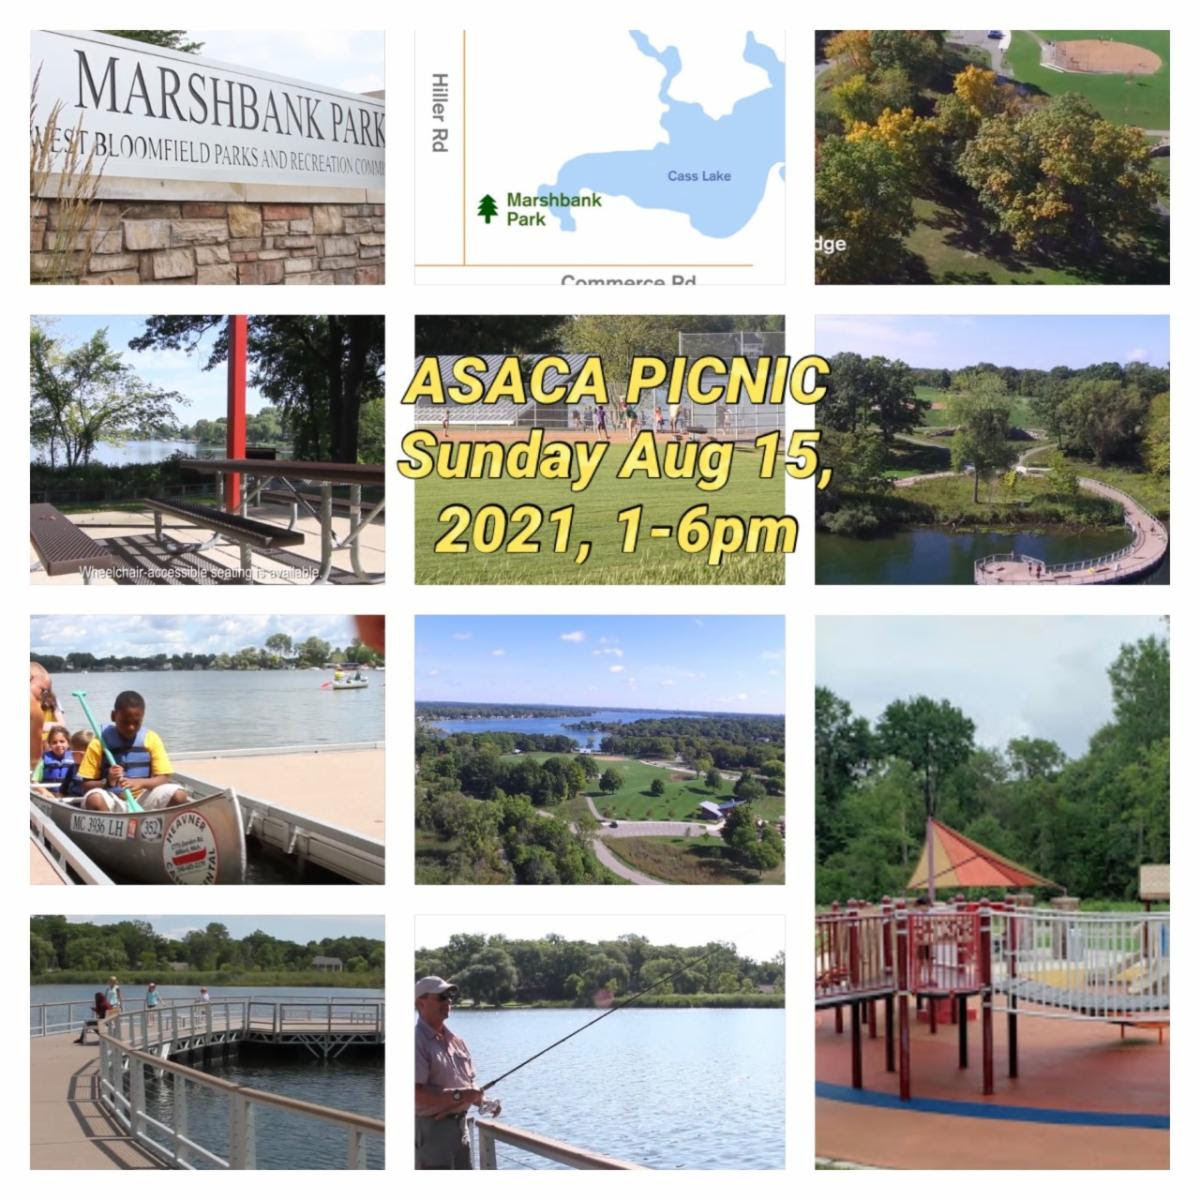 Marshbank Picnic Flyer.jpg